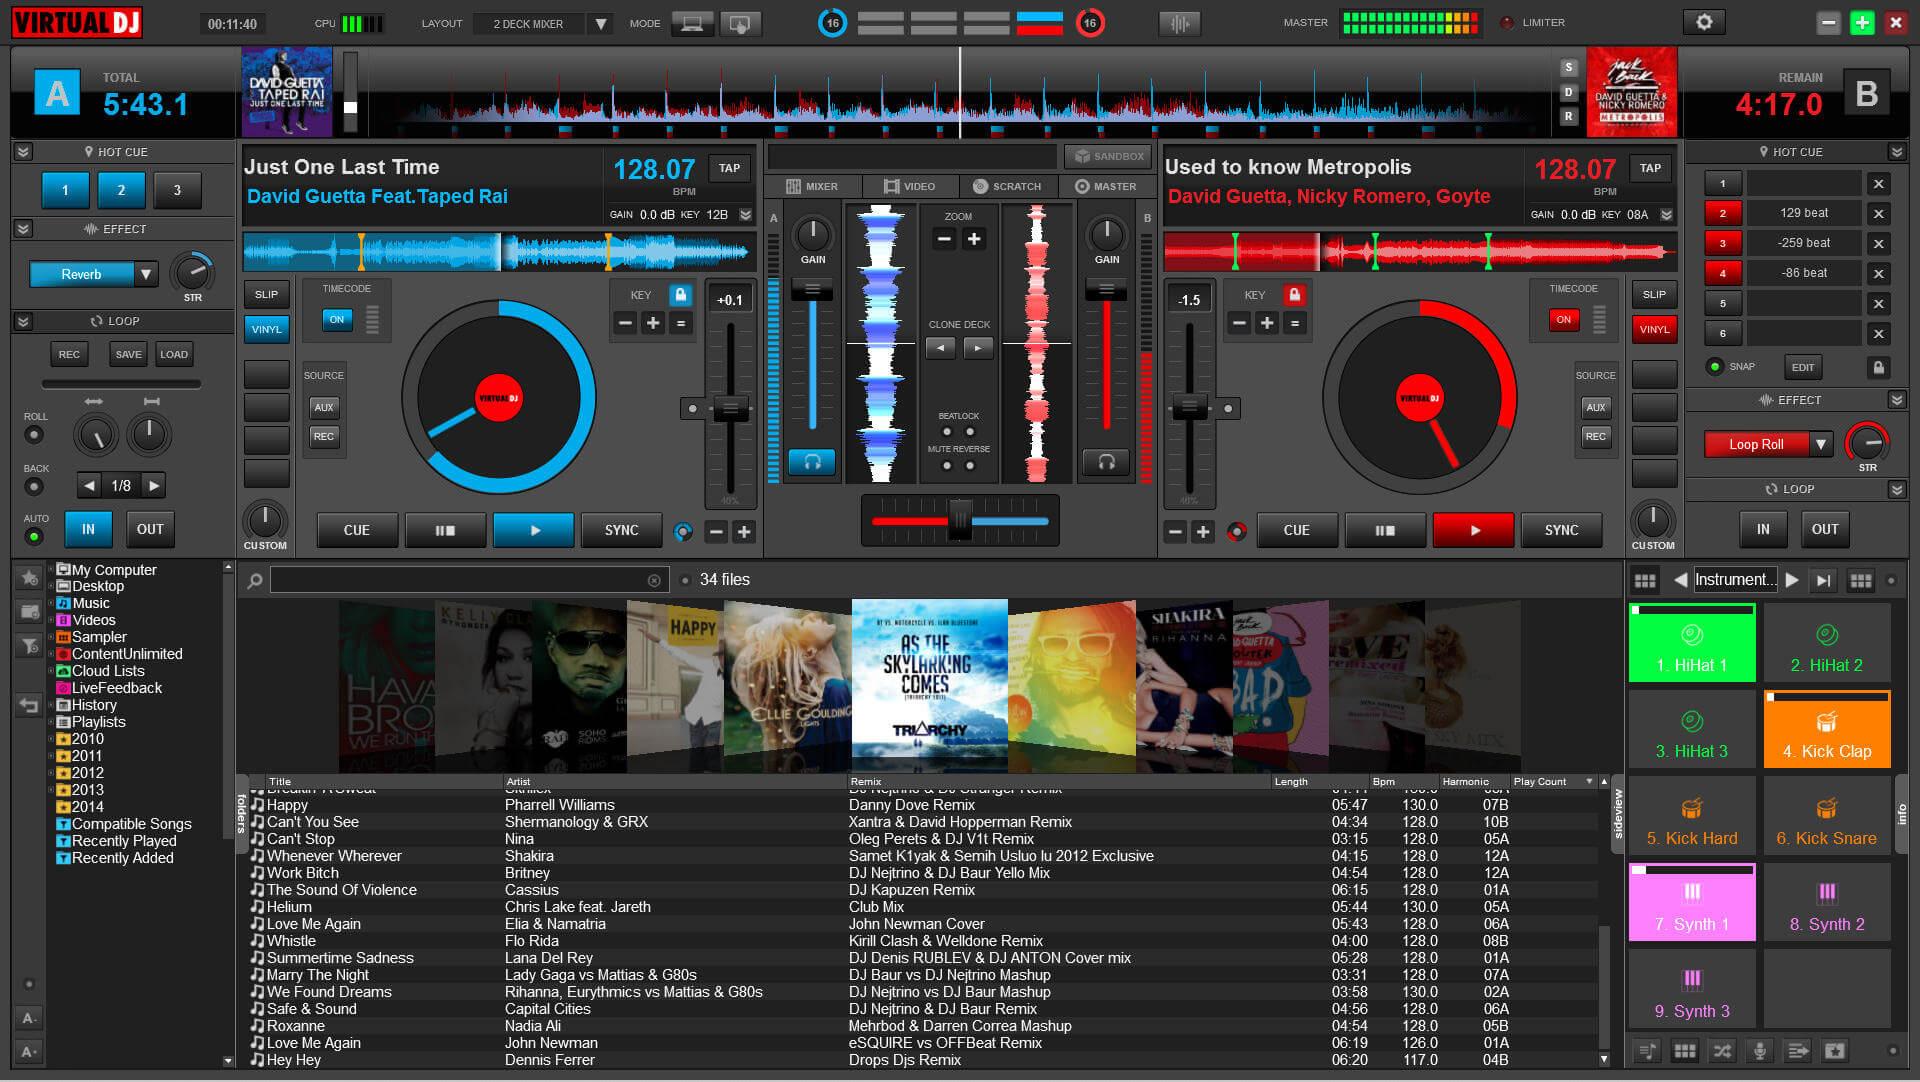 Virtual DJ Studio Patch